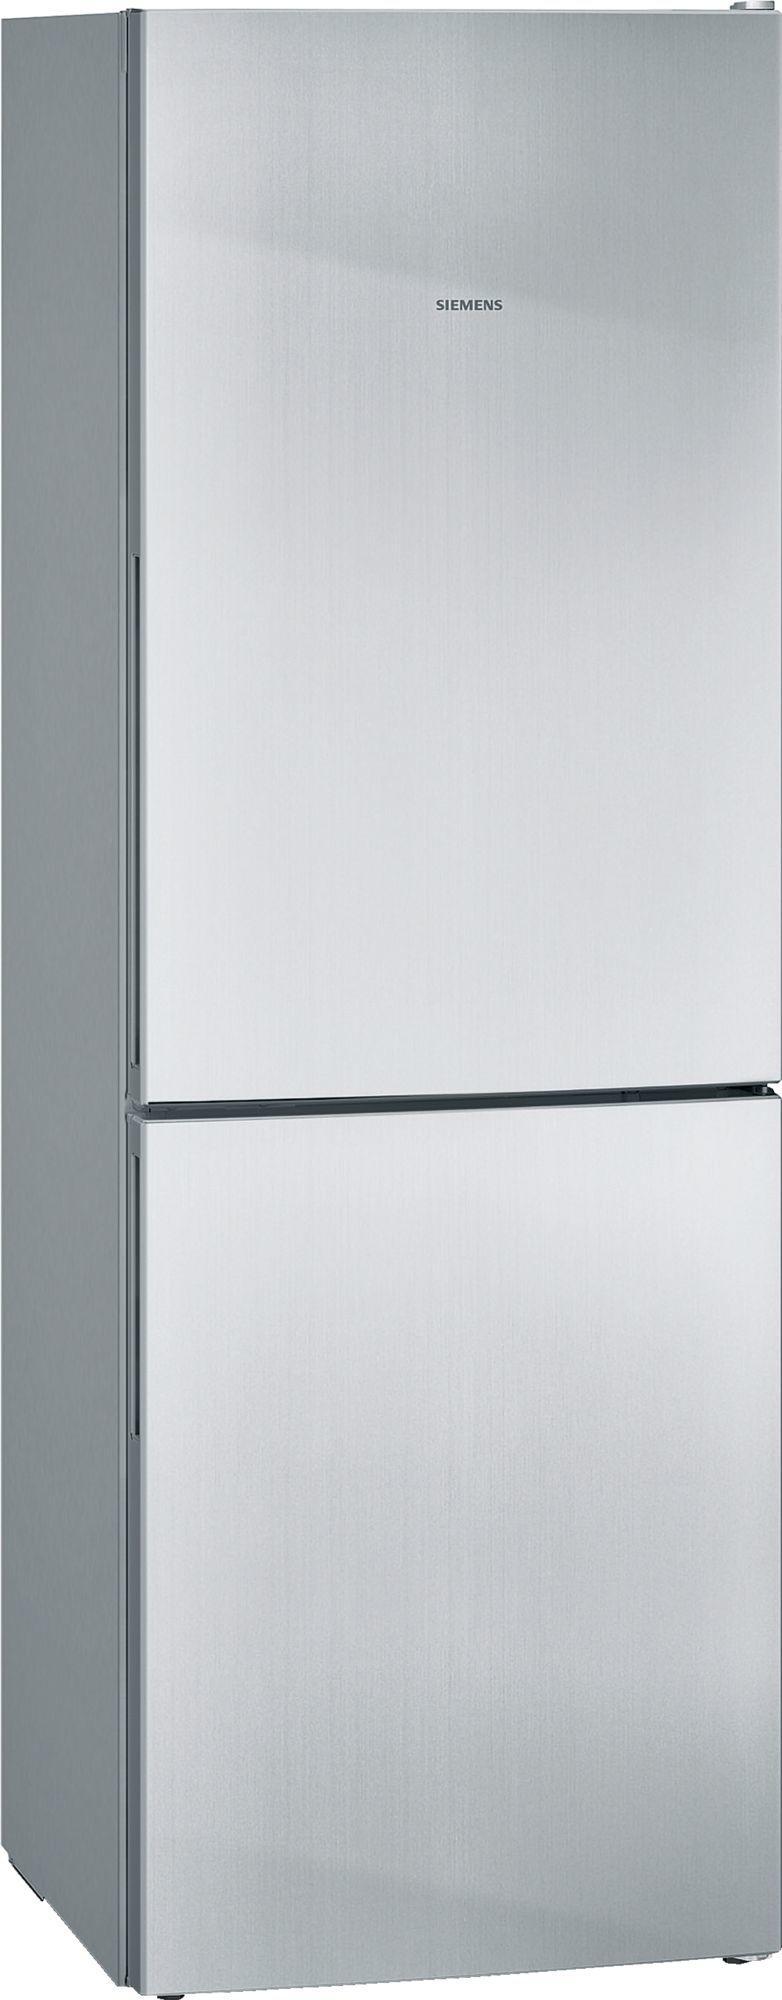 Image of iQ300 KG33VVIEAG 287 Litre Fridge Freezer | Stainless Steel